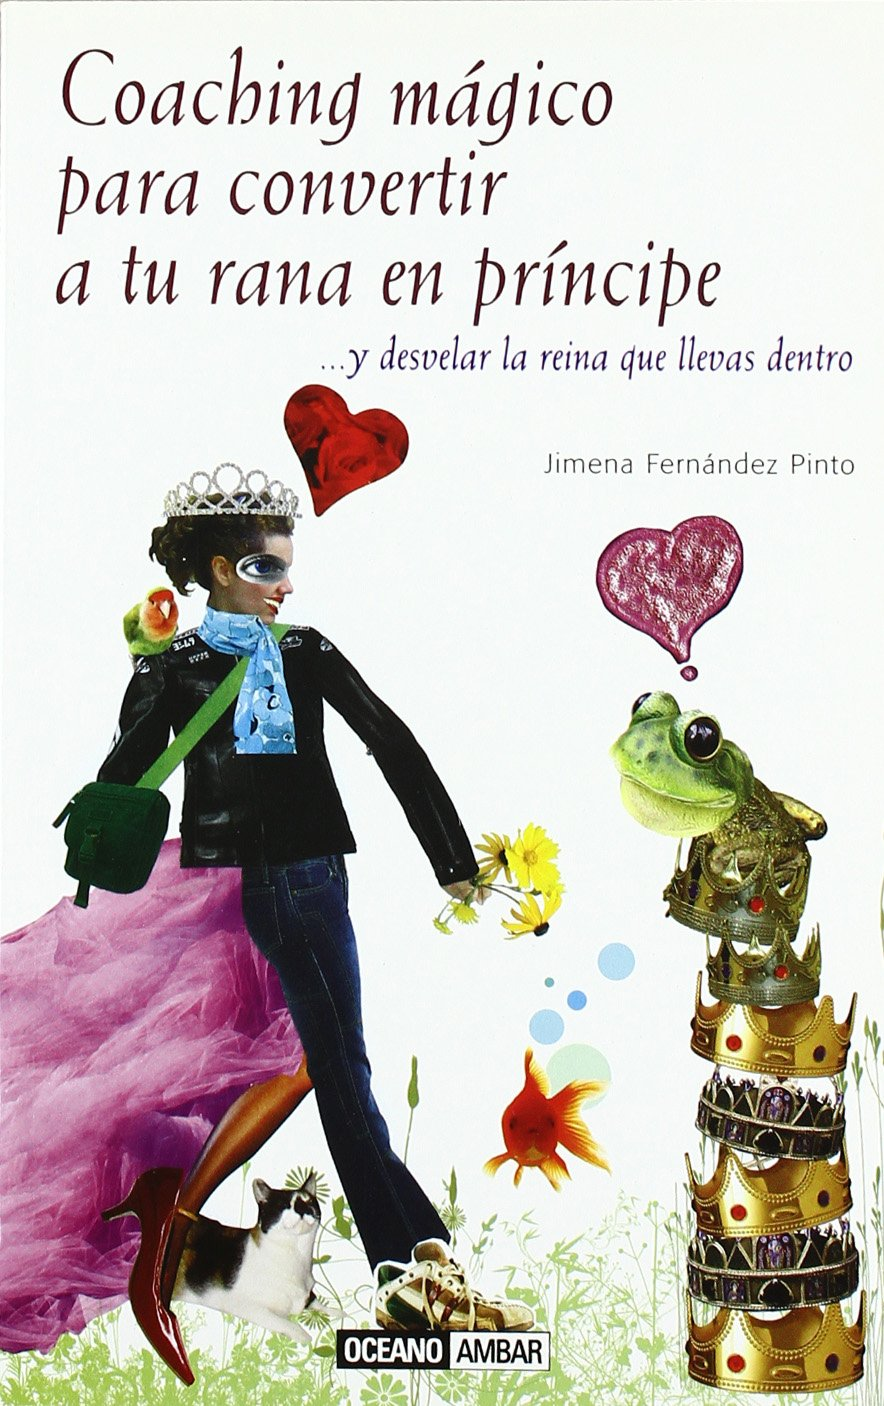 Download Coaching magico para convertir a tu rana en principe/ Magic Coaching To Turn To Your Frog Into a Prince: ...y desvelar la reina que llevas dentro/ ... Personal/ Very Personal) (Spanish Edition) PDF Text fb2 book